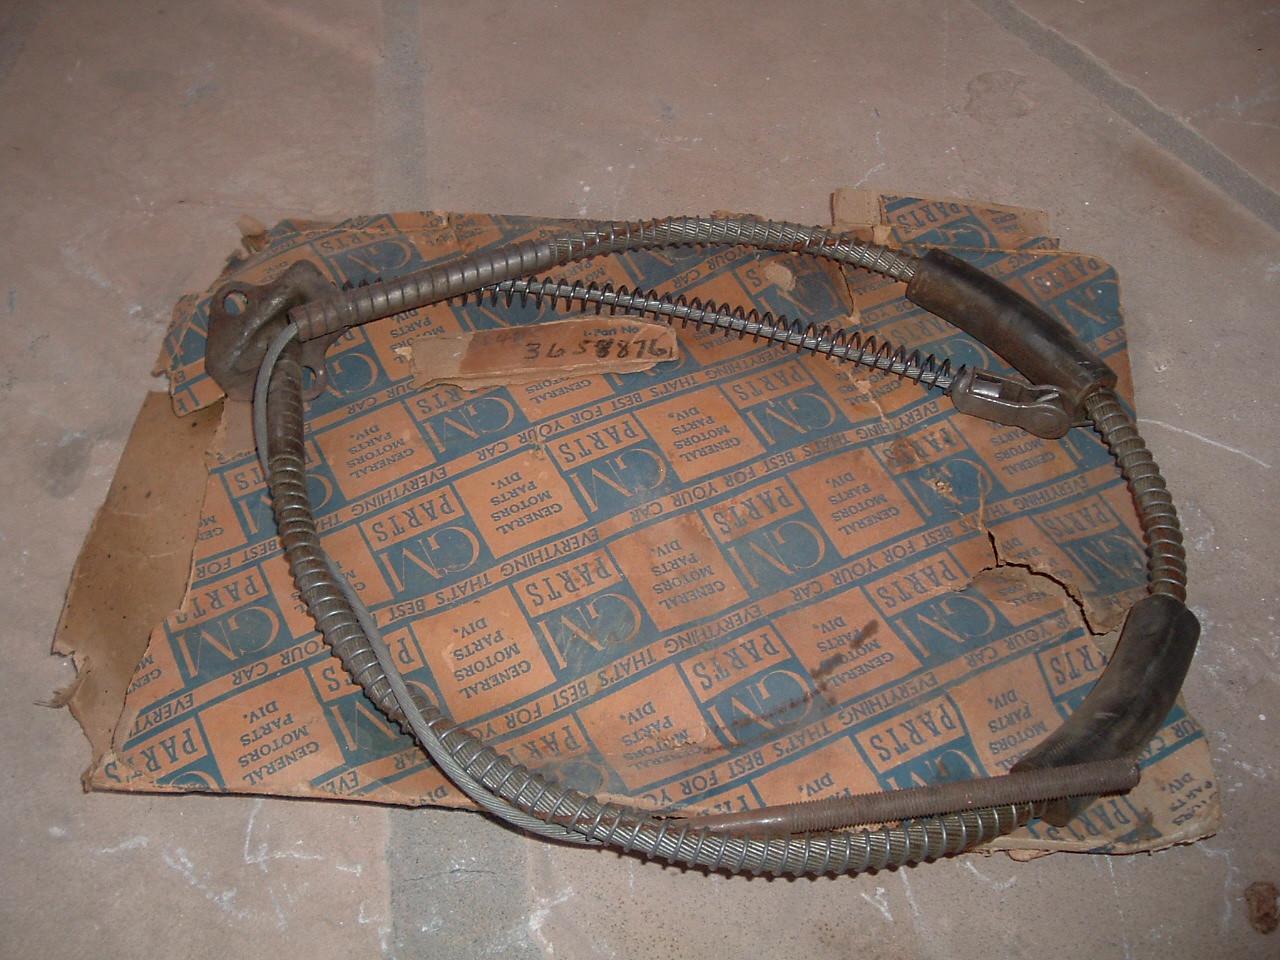 1937 38 39 40 41 42 chevrolet parking brake cable nos gm 3658405 (z 3658405)